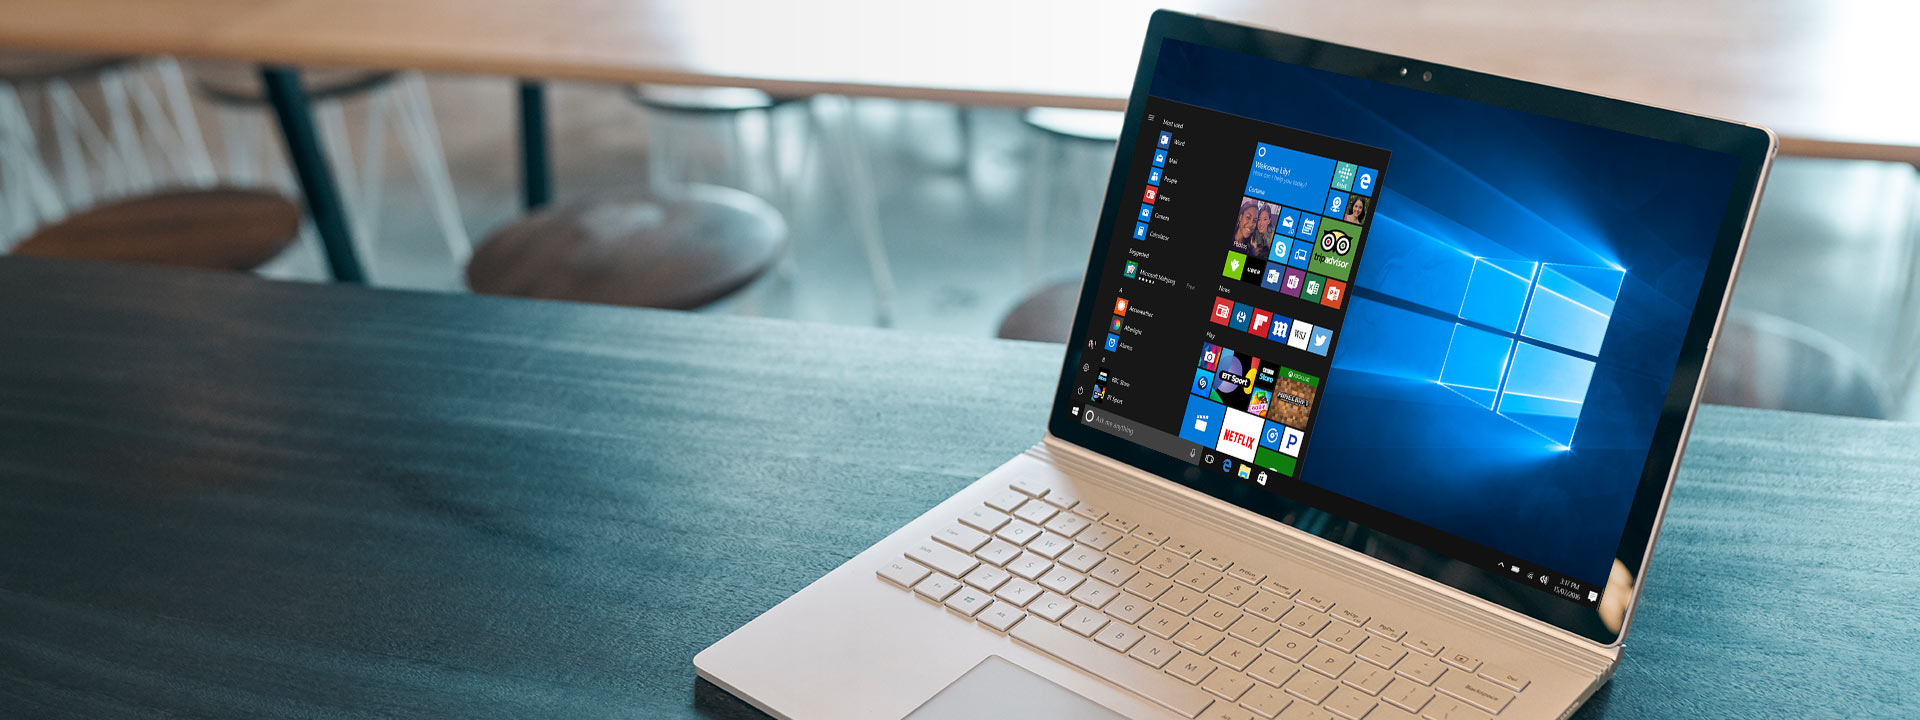 A Windows 10 PC with start menu